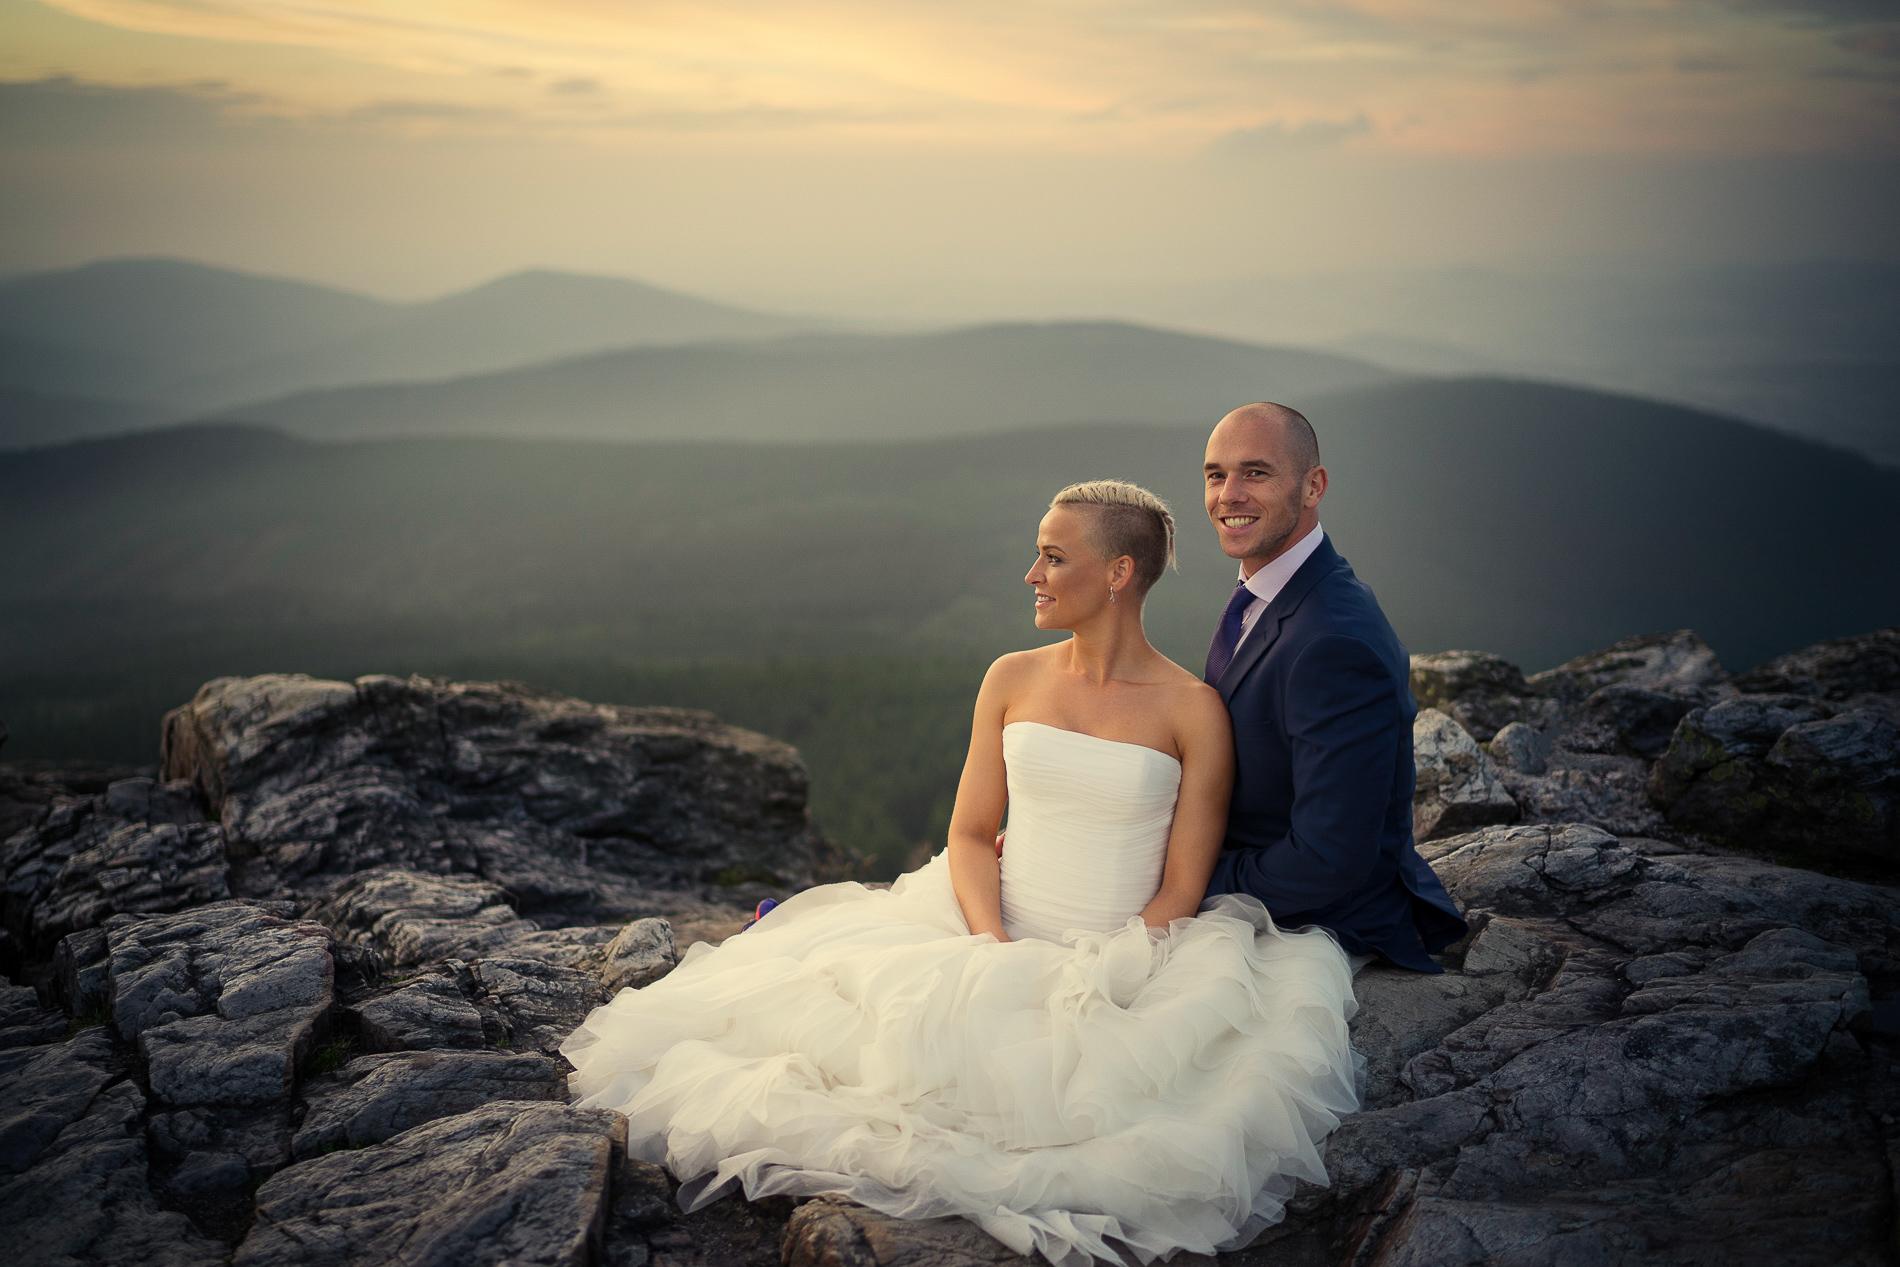 svatba - Ještěd